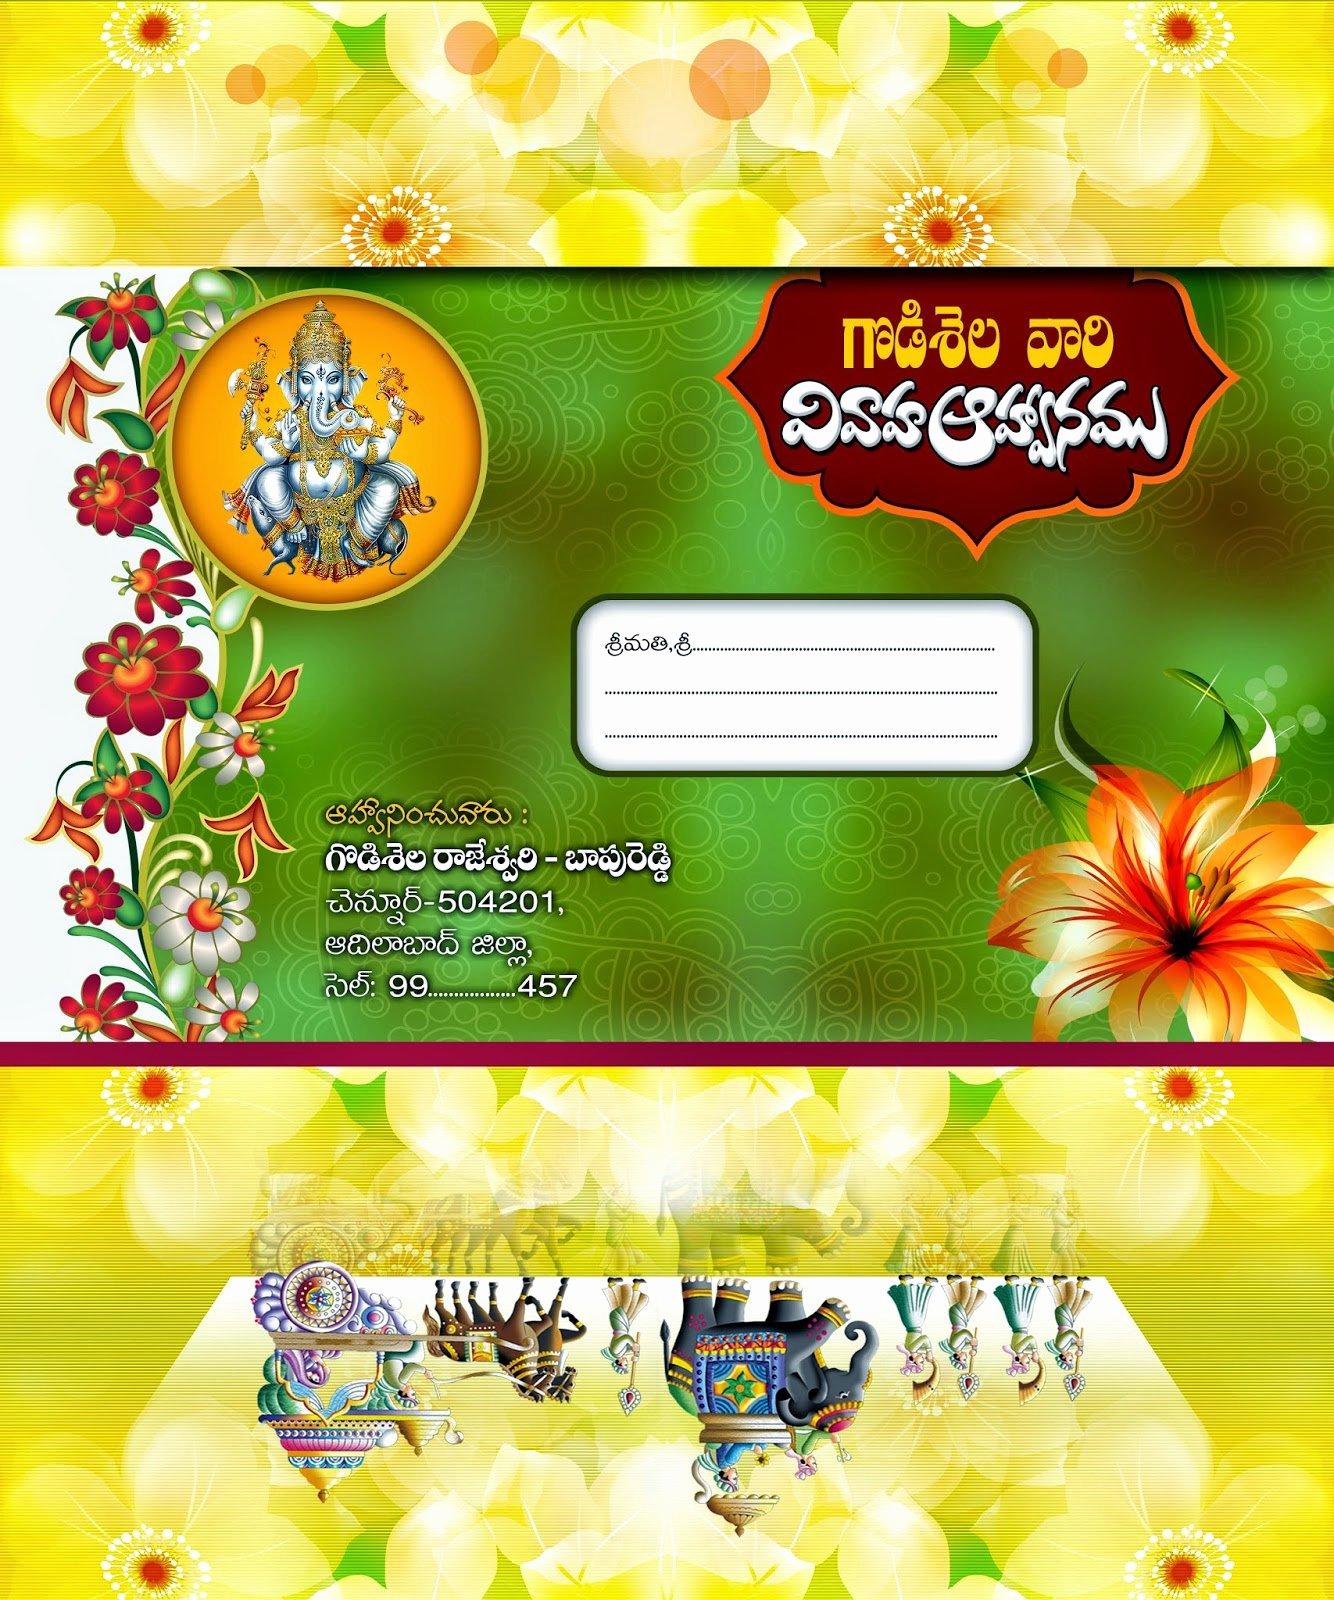 Wedding Invitation Template Psd Elegant Wedding Invitation Card Psd Design Template Free